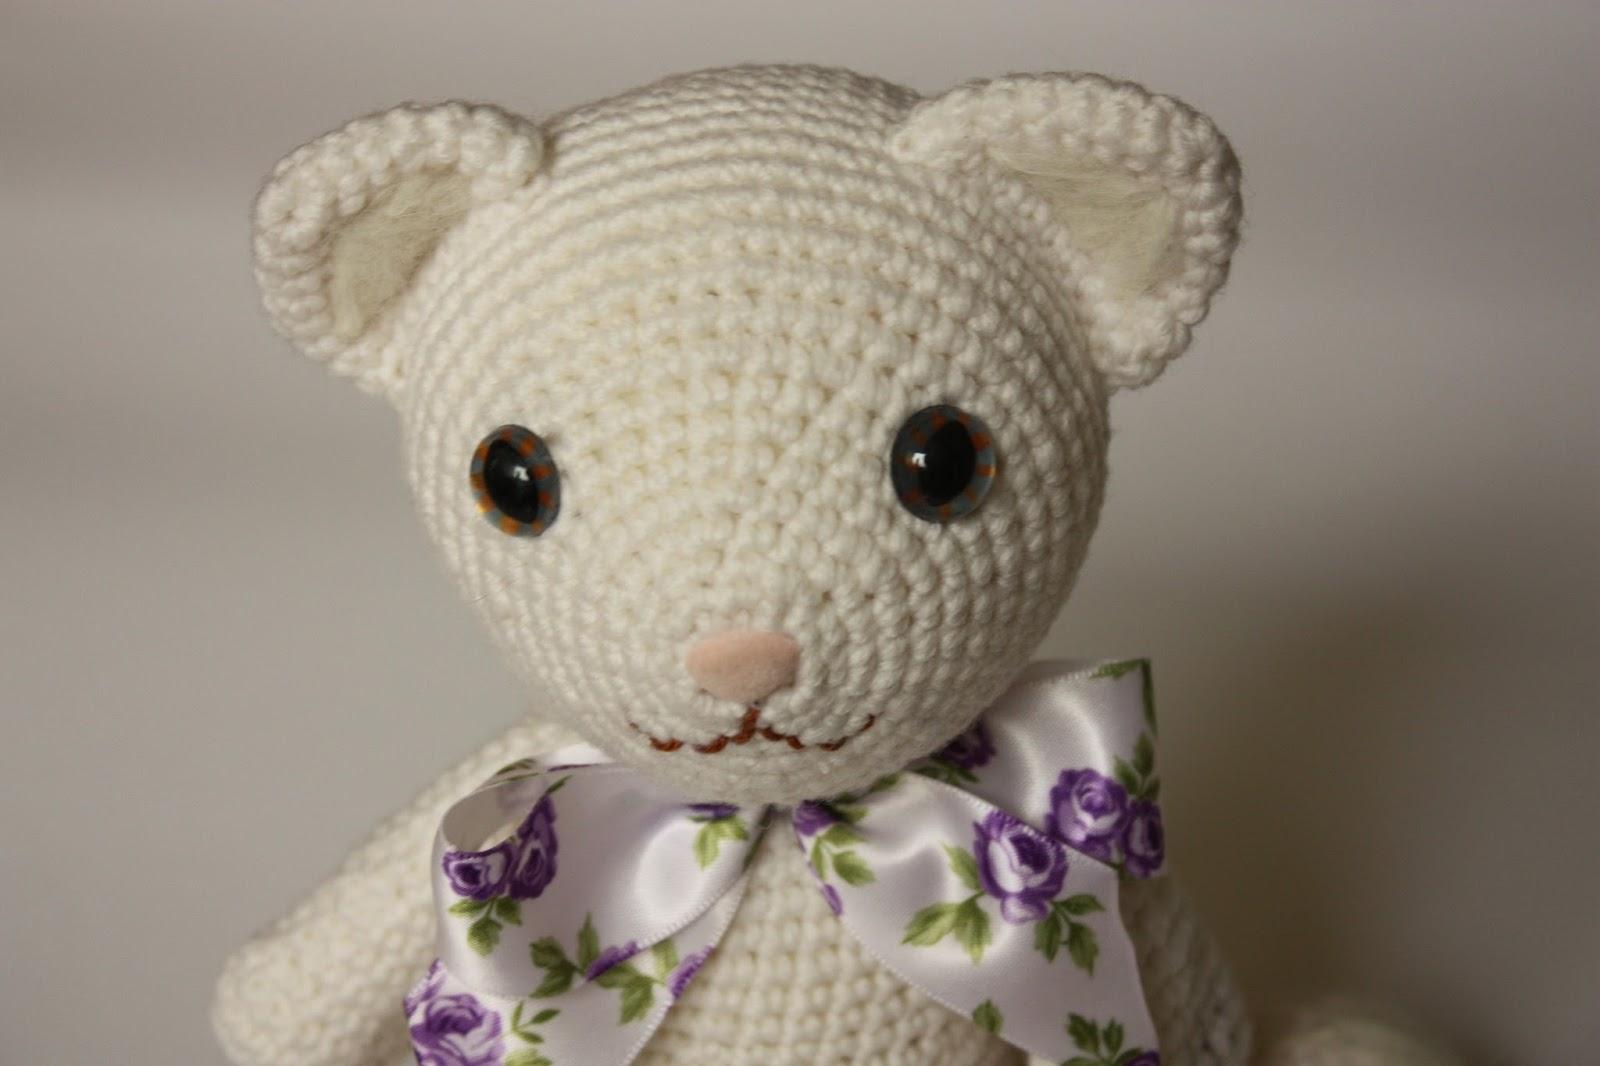 Amigurumi Cat Toys : HAPPYAMIGURUMI: New Amigurumi Pattern - Amigrumi White Cat ...